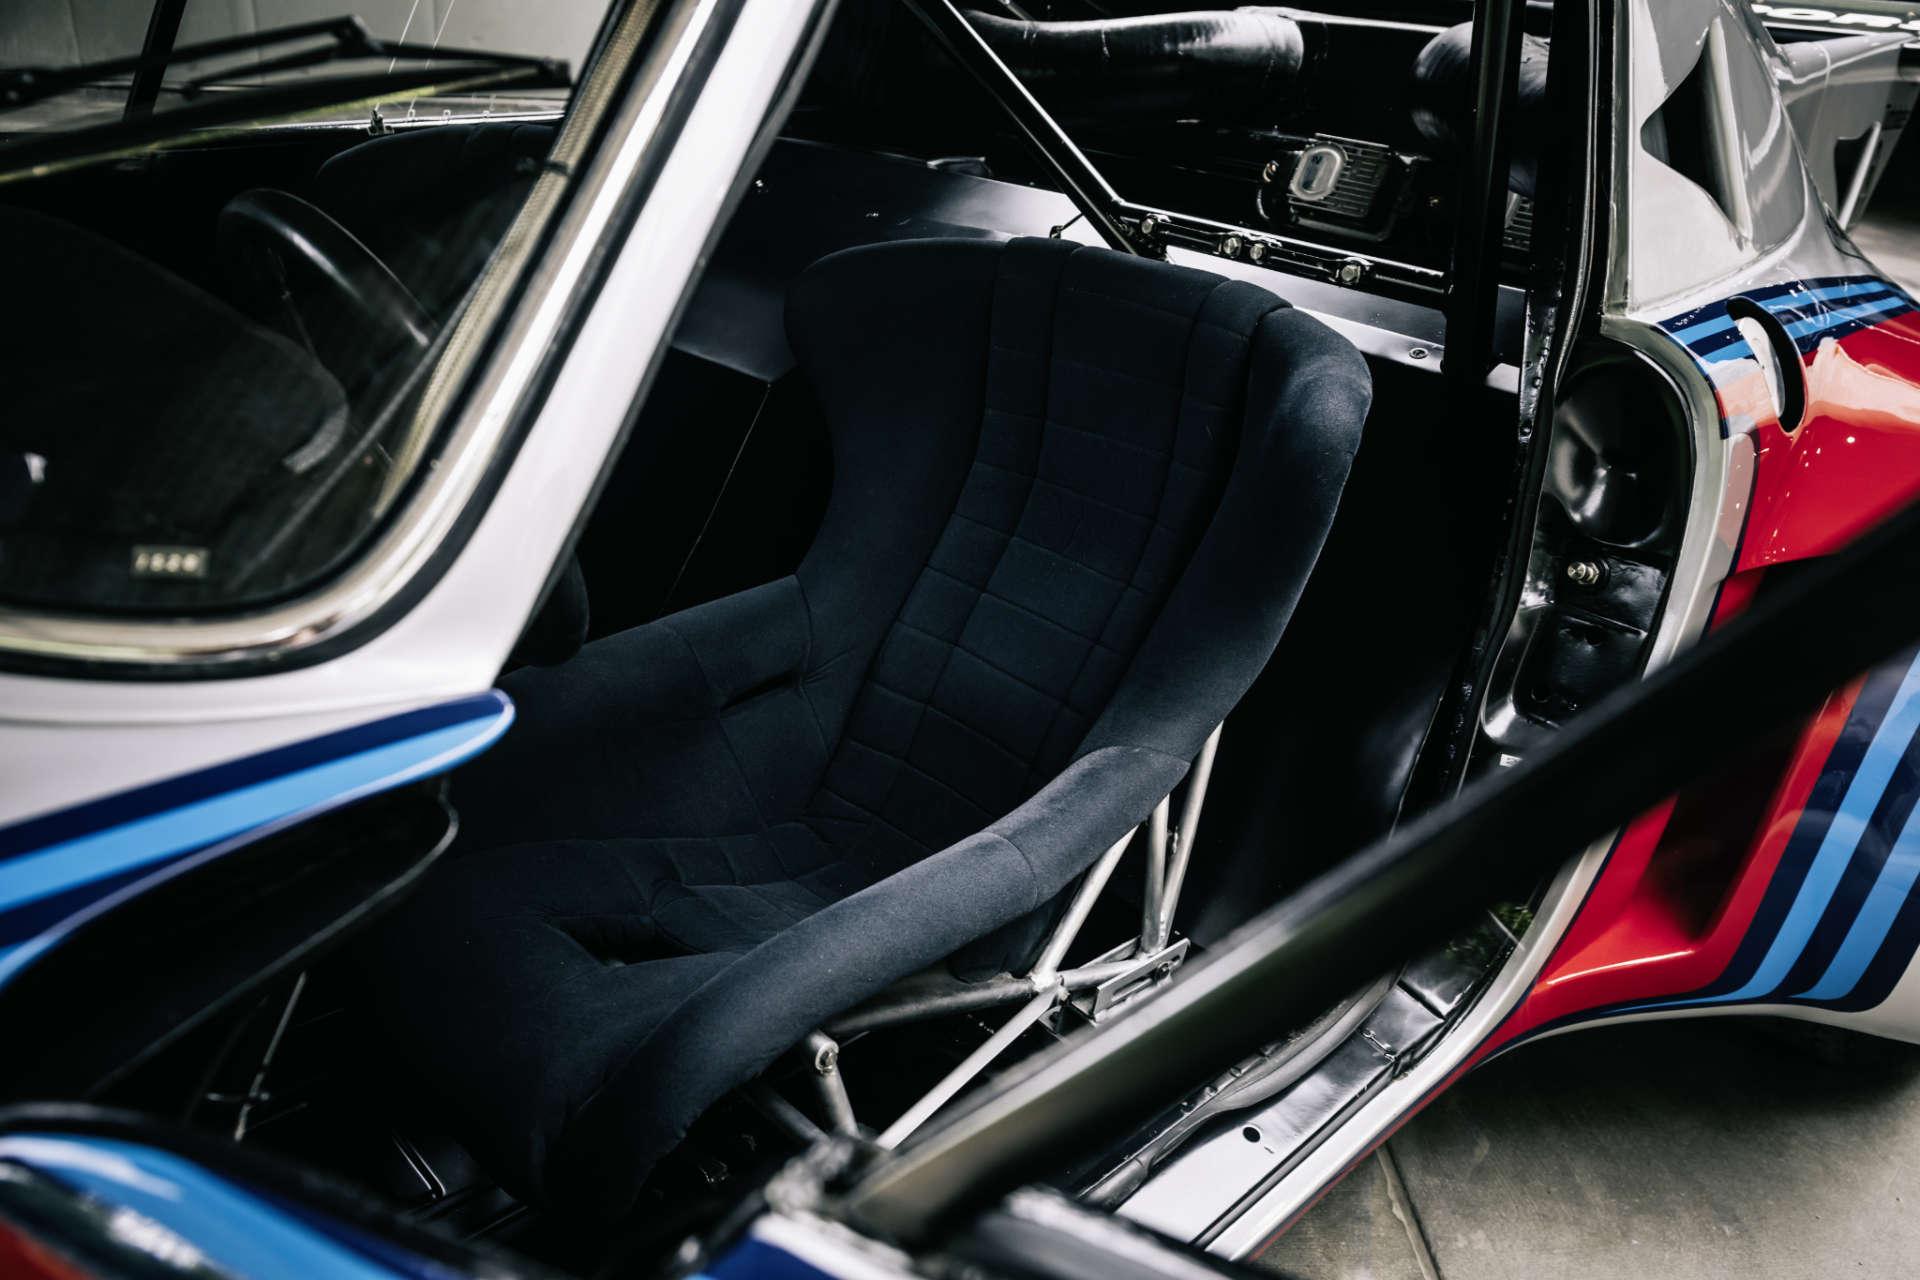 911 Carrera RSR 2.1 Turbo